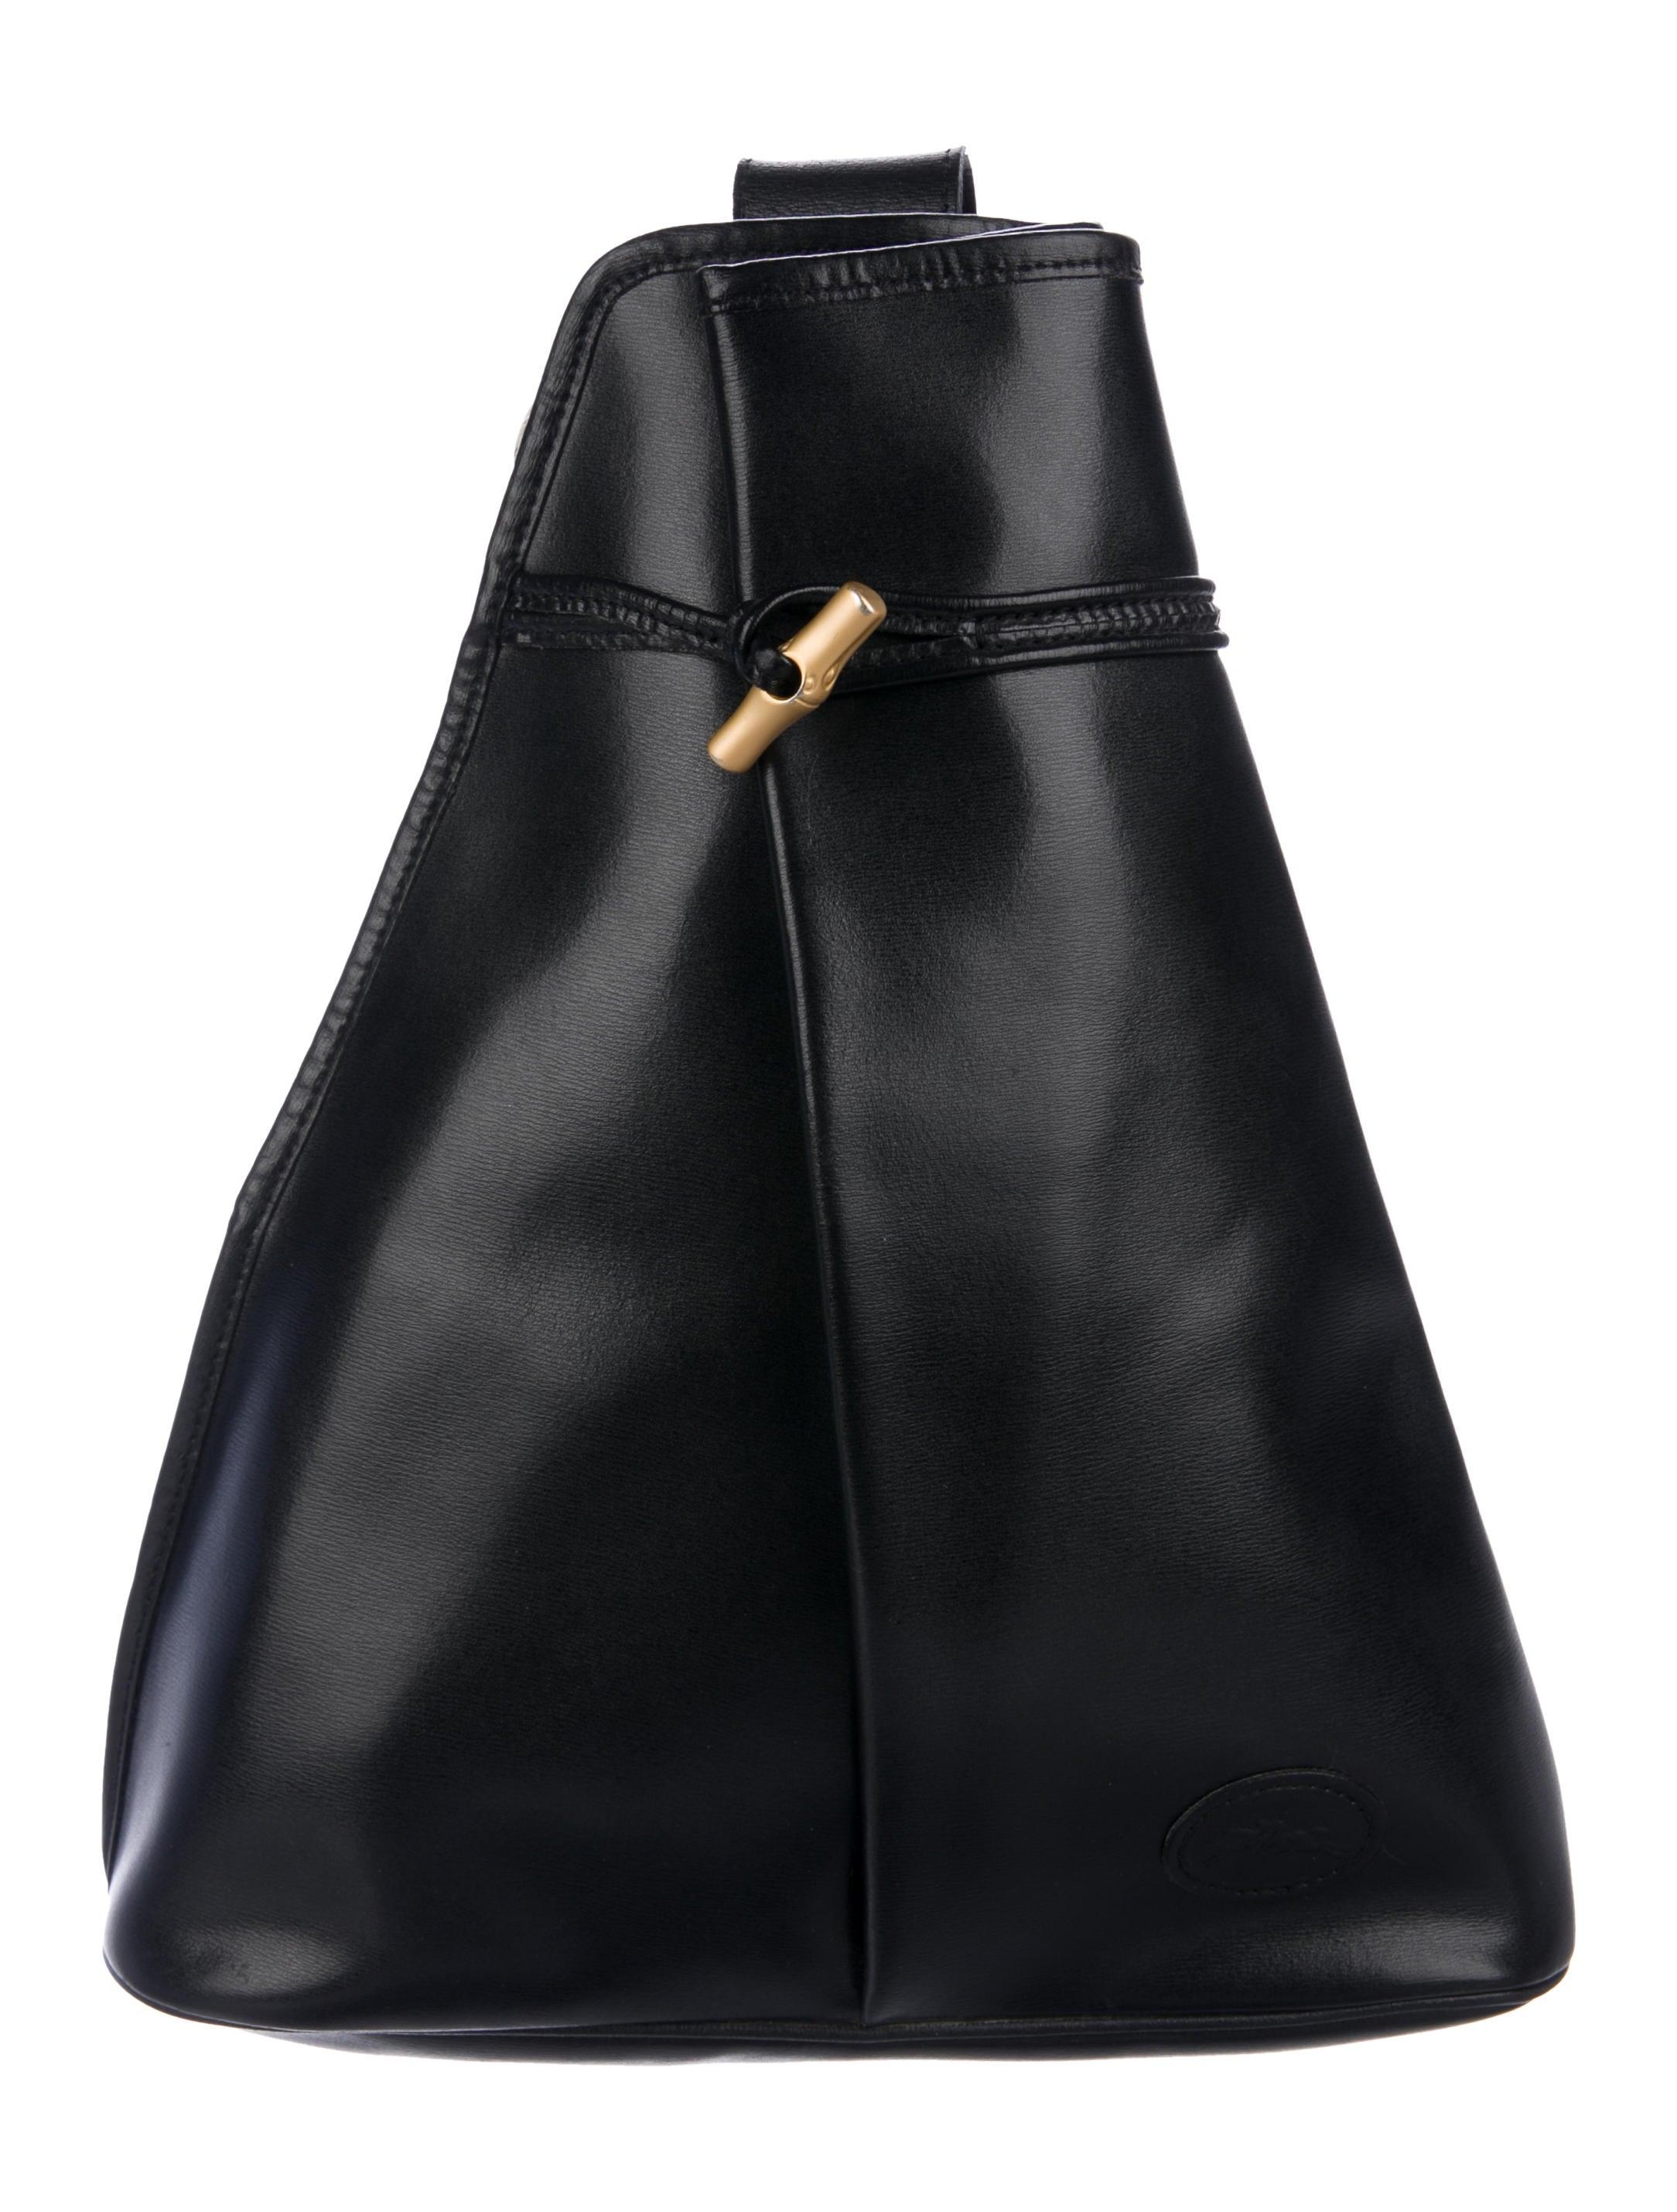 Longchamp Roseau Sling Bag - Handbags - WL821998   The RealReal